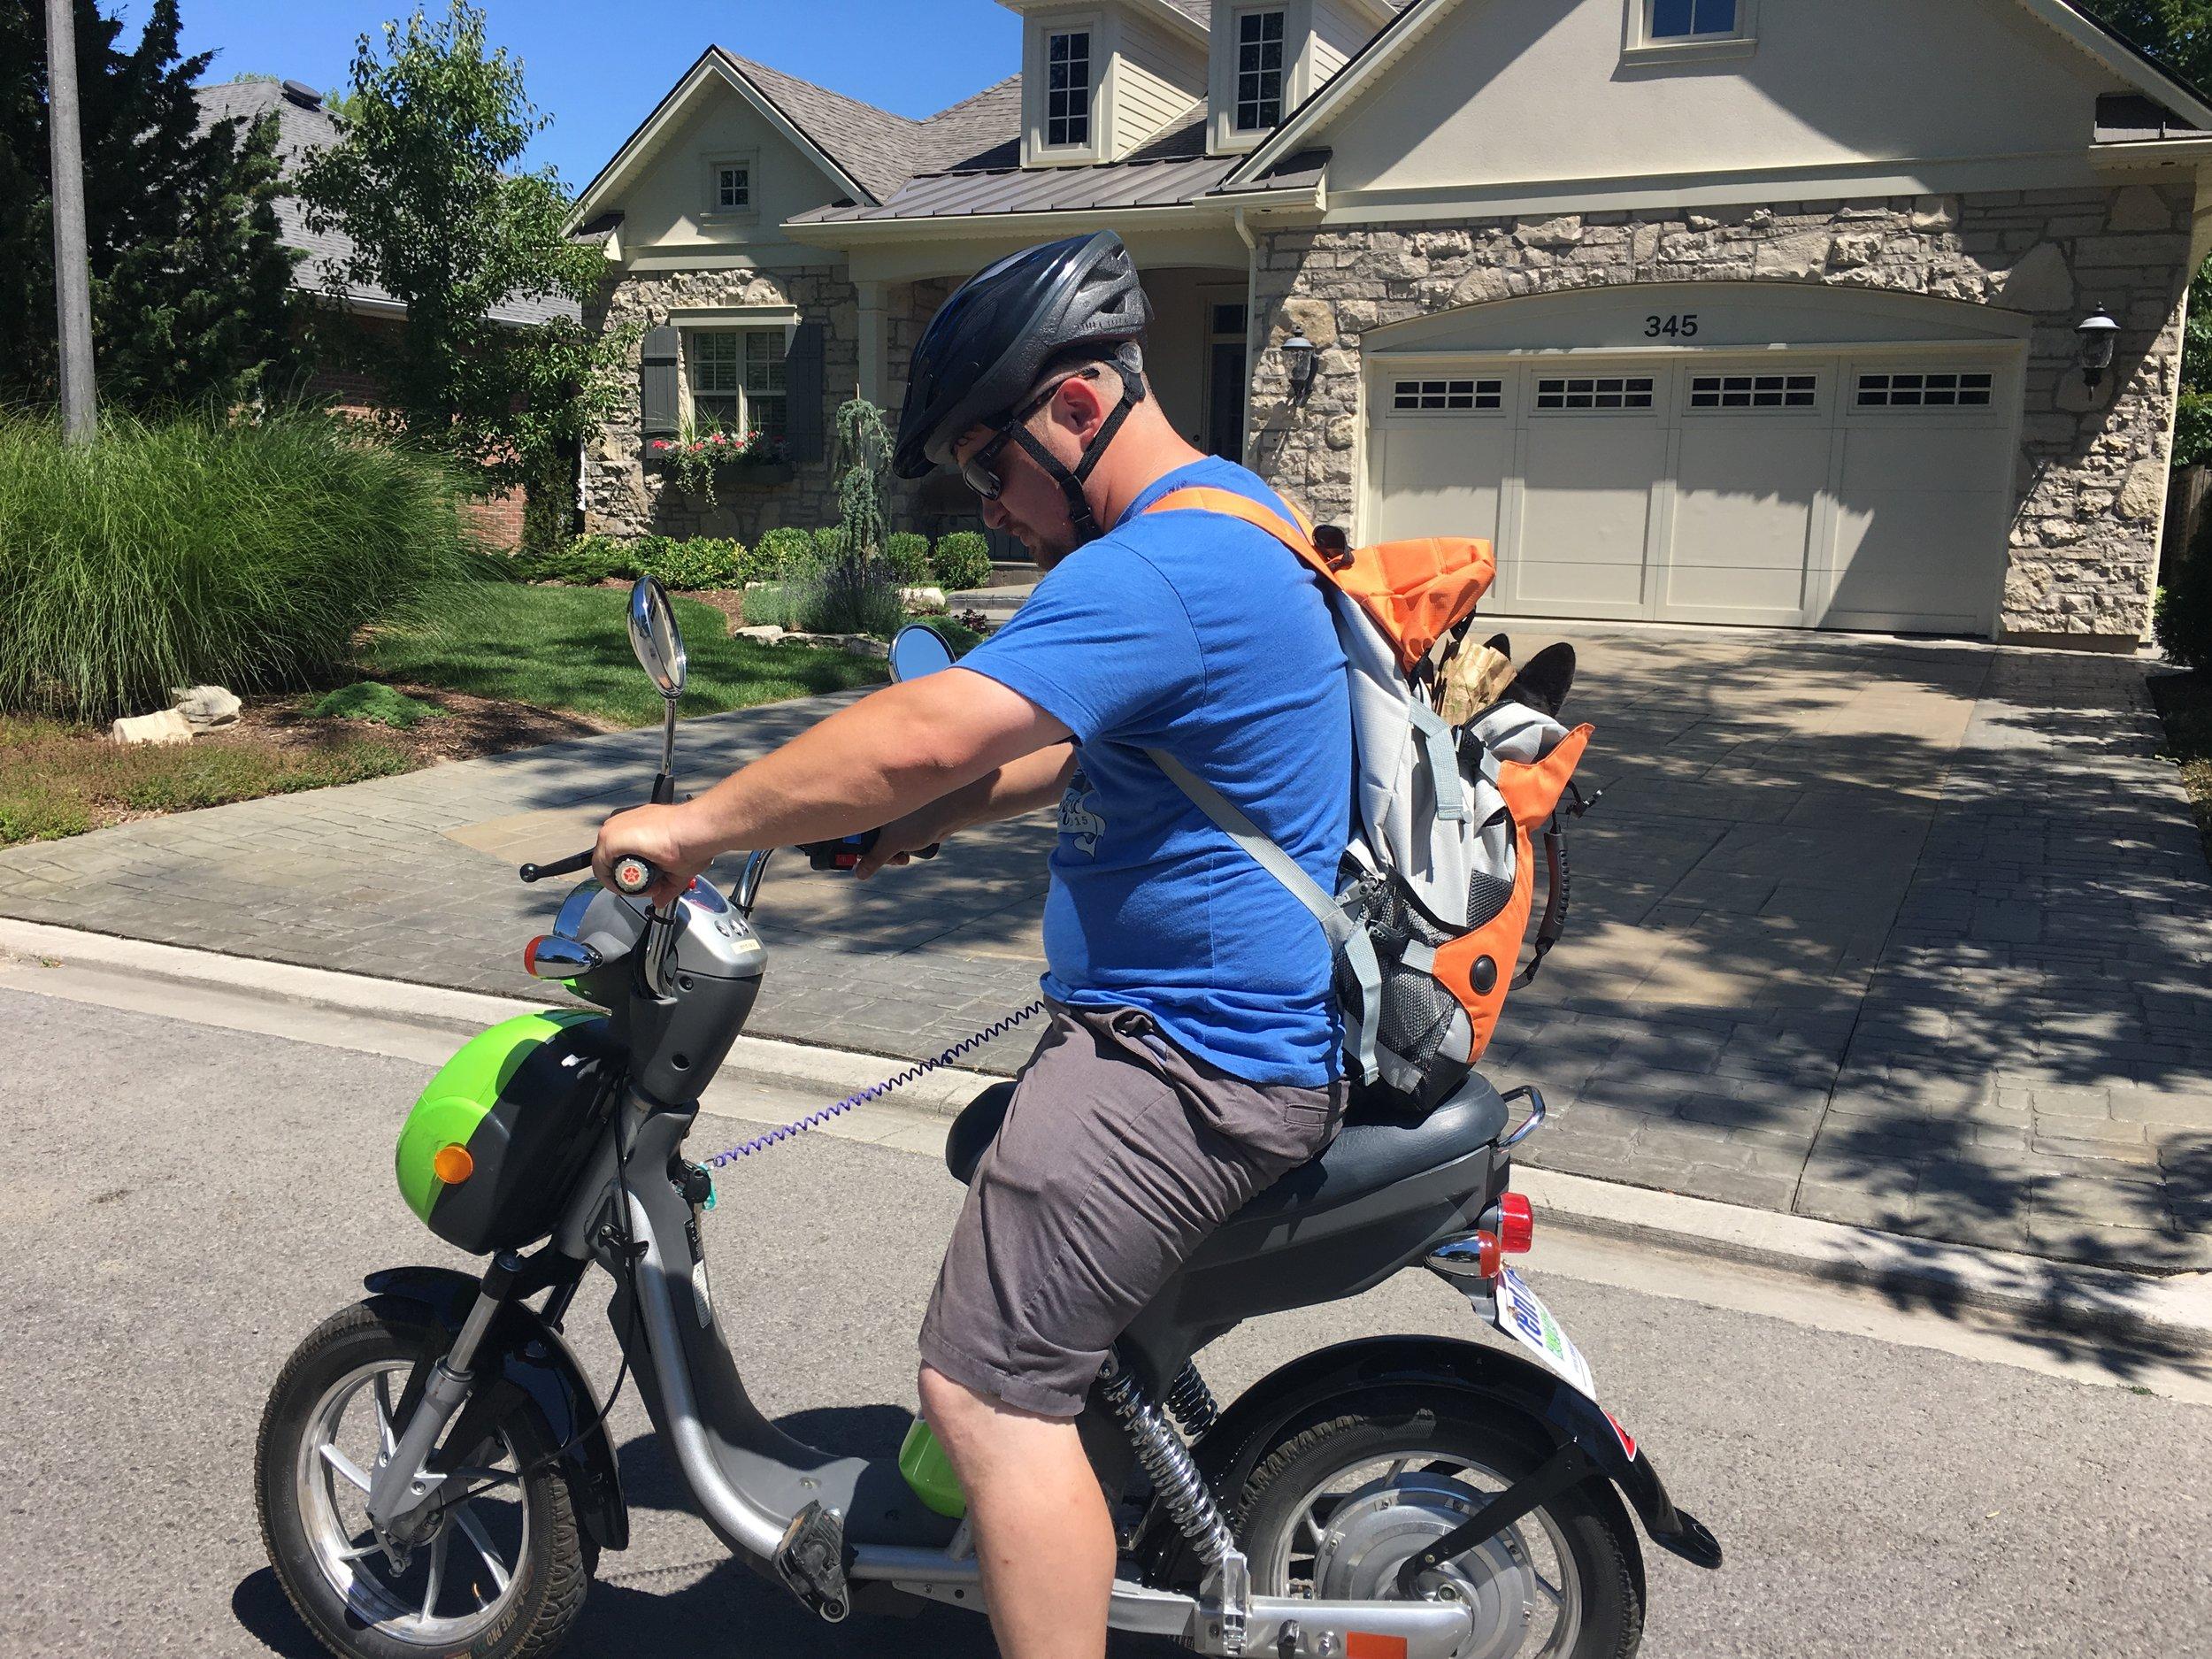 Mike e-skooting through the neighborhoods